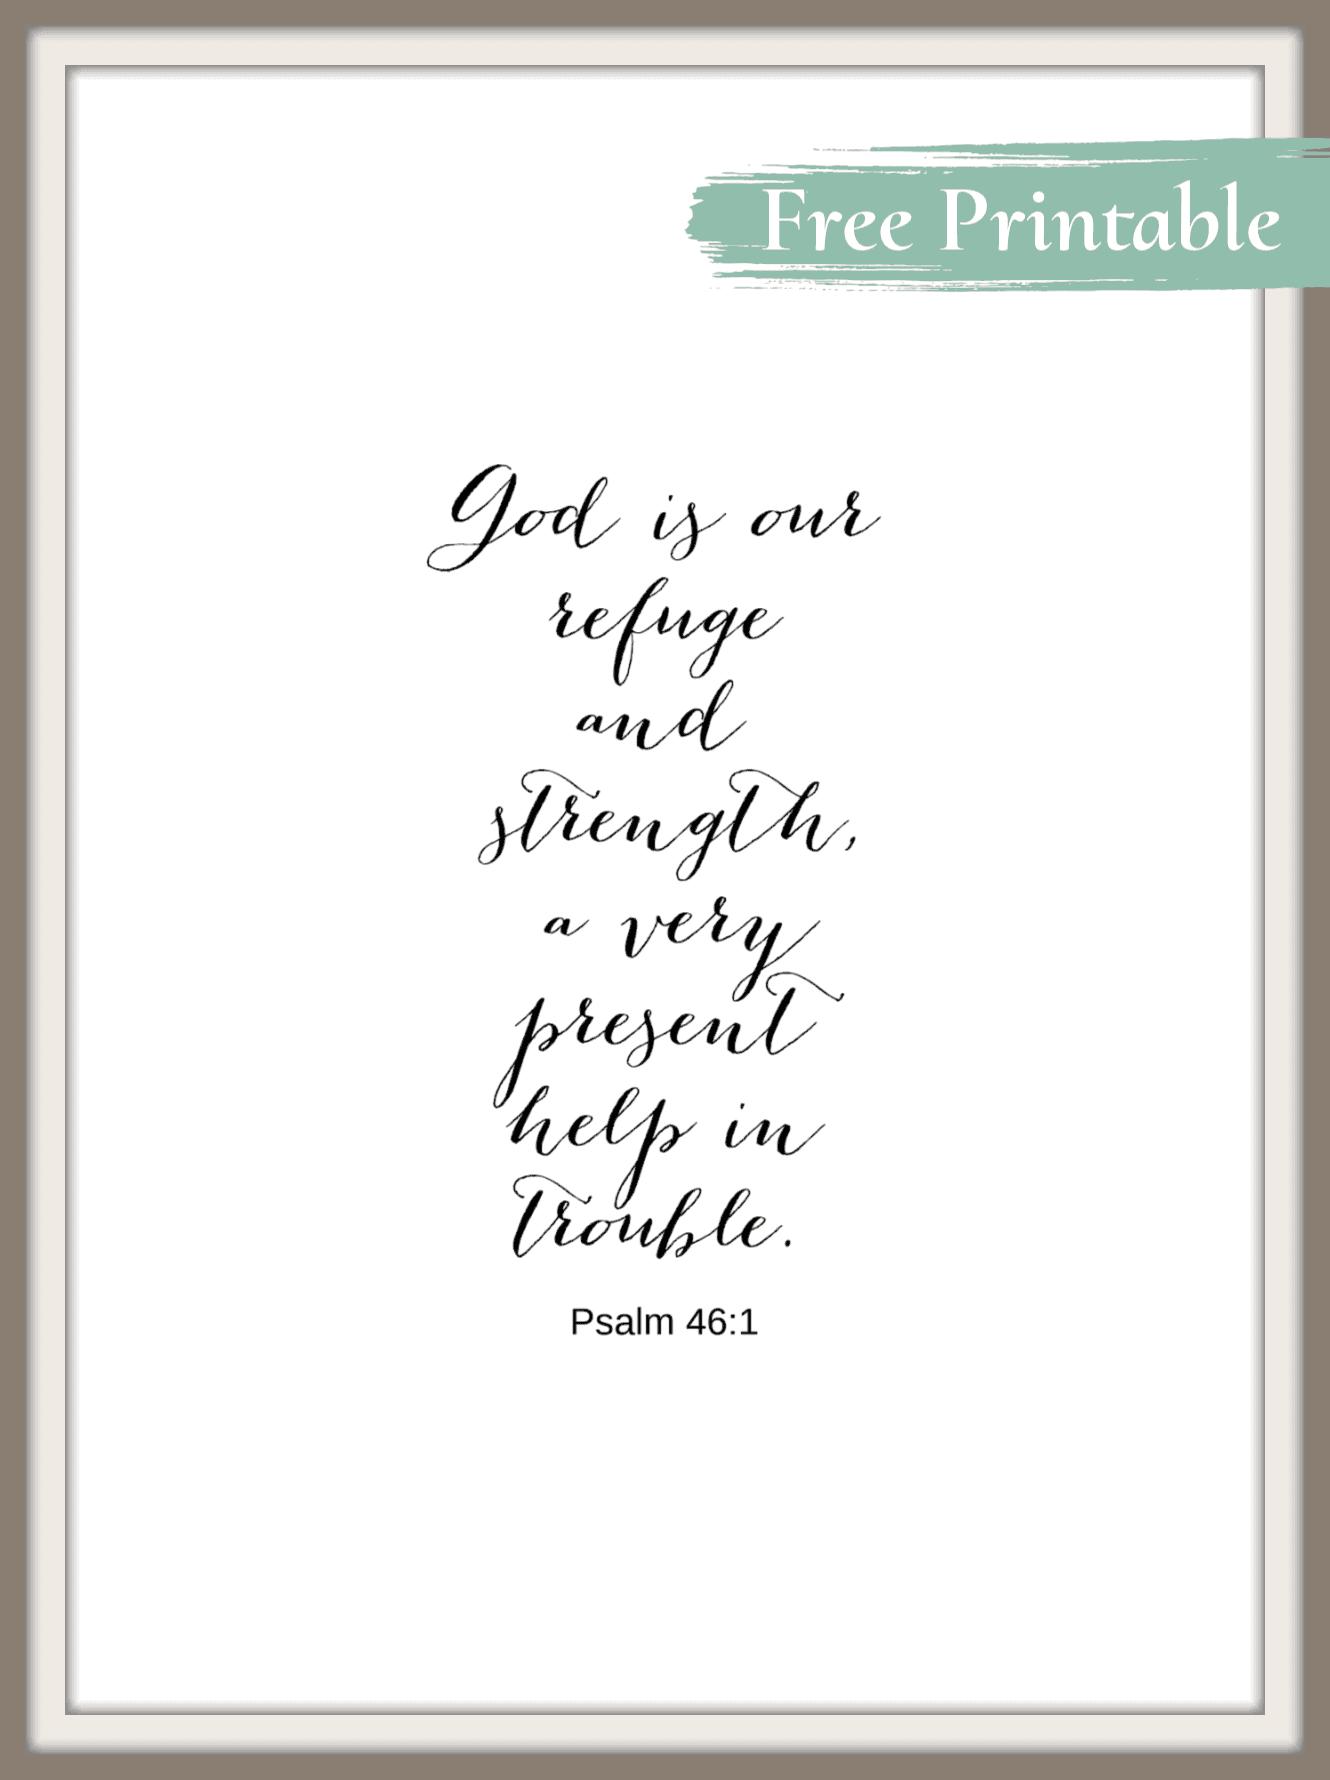 free printable psalm 46:1